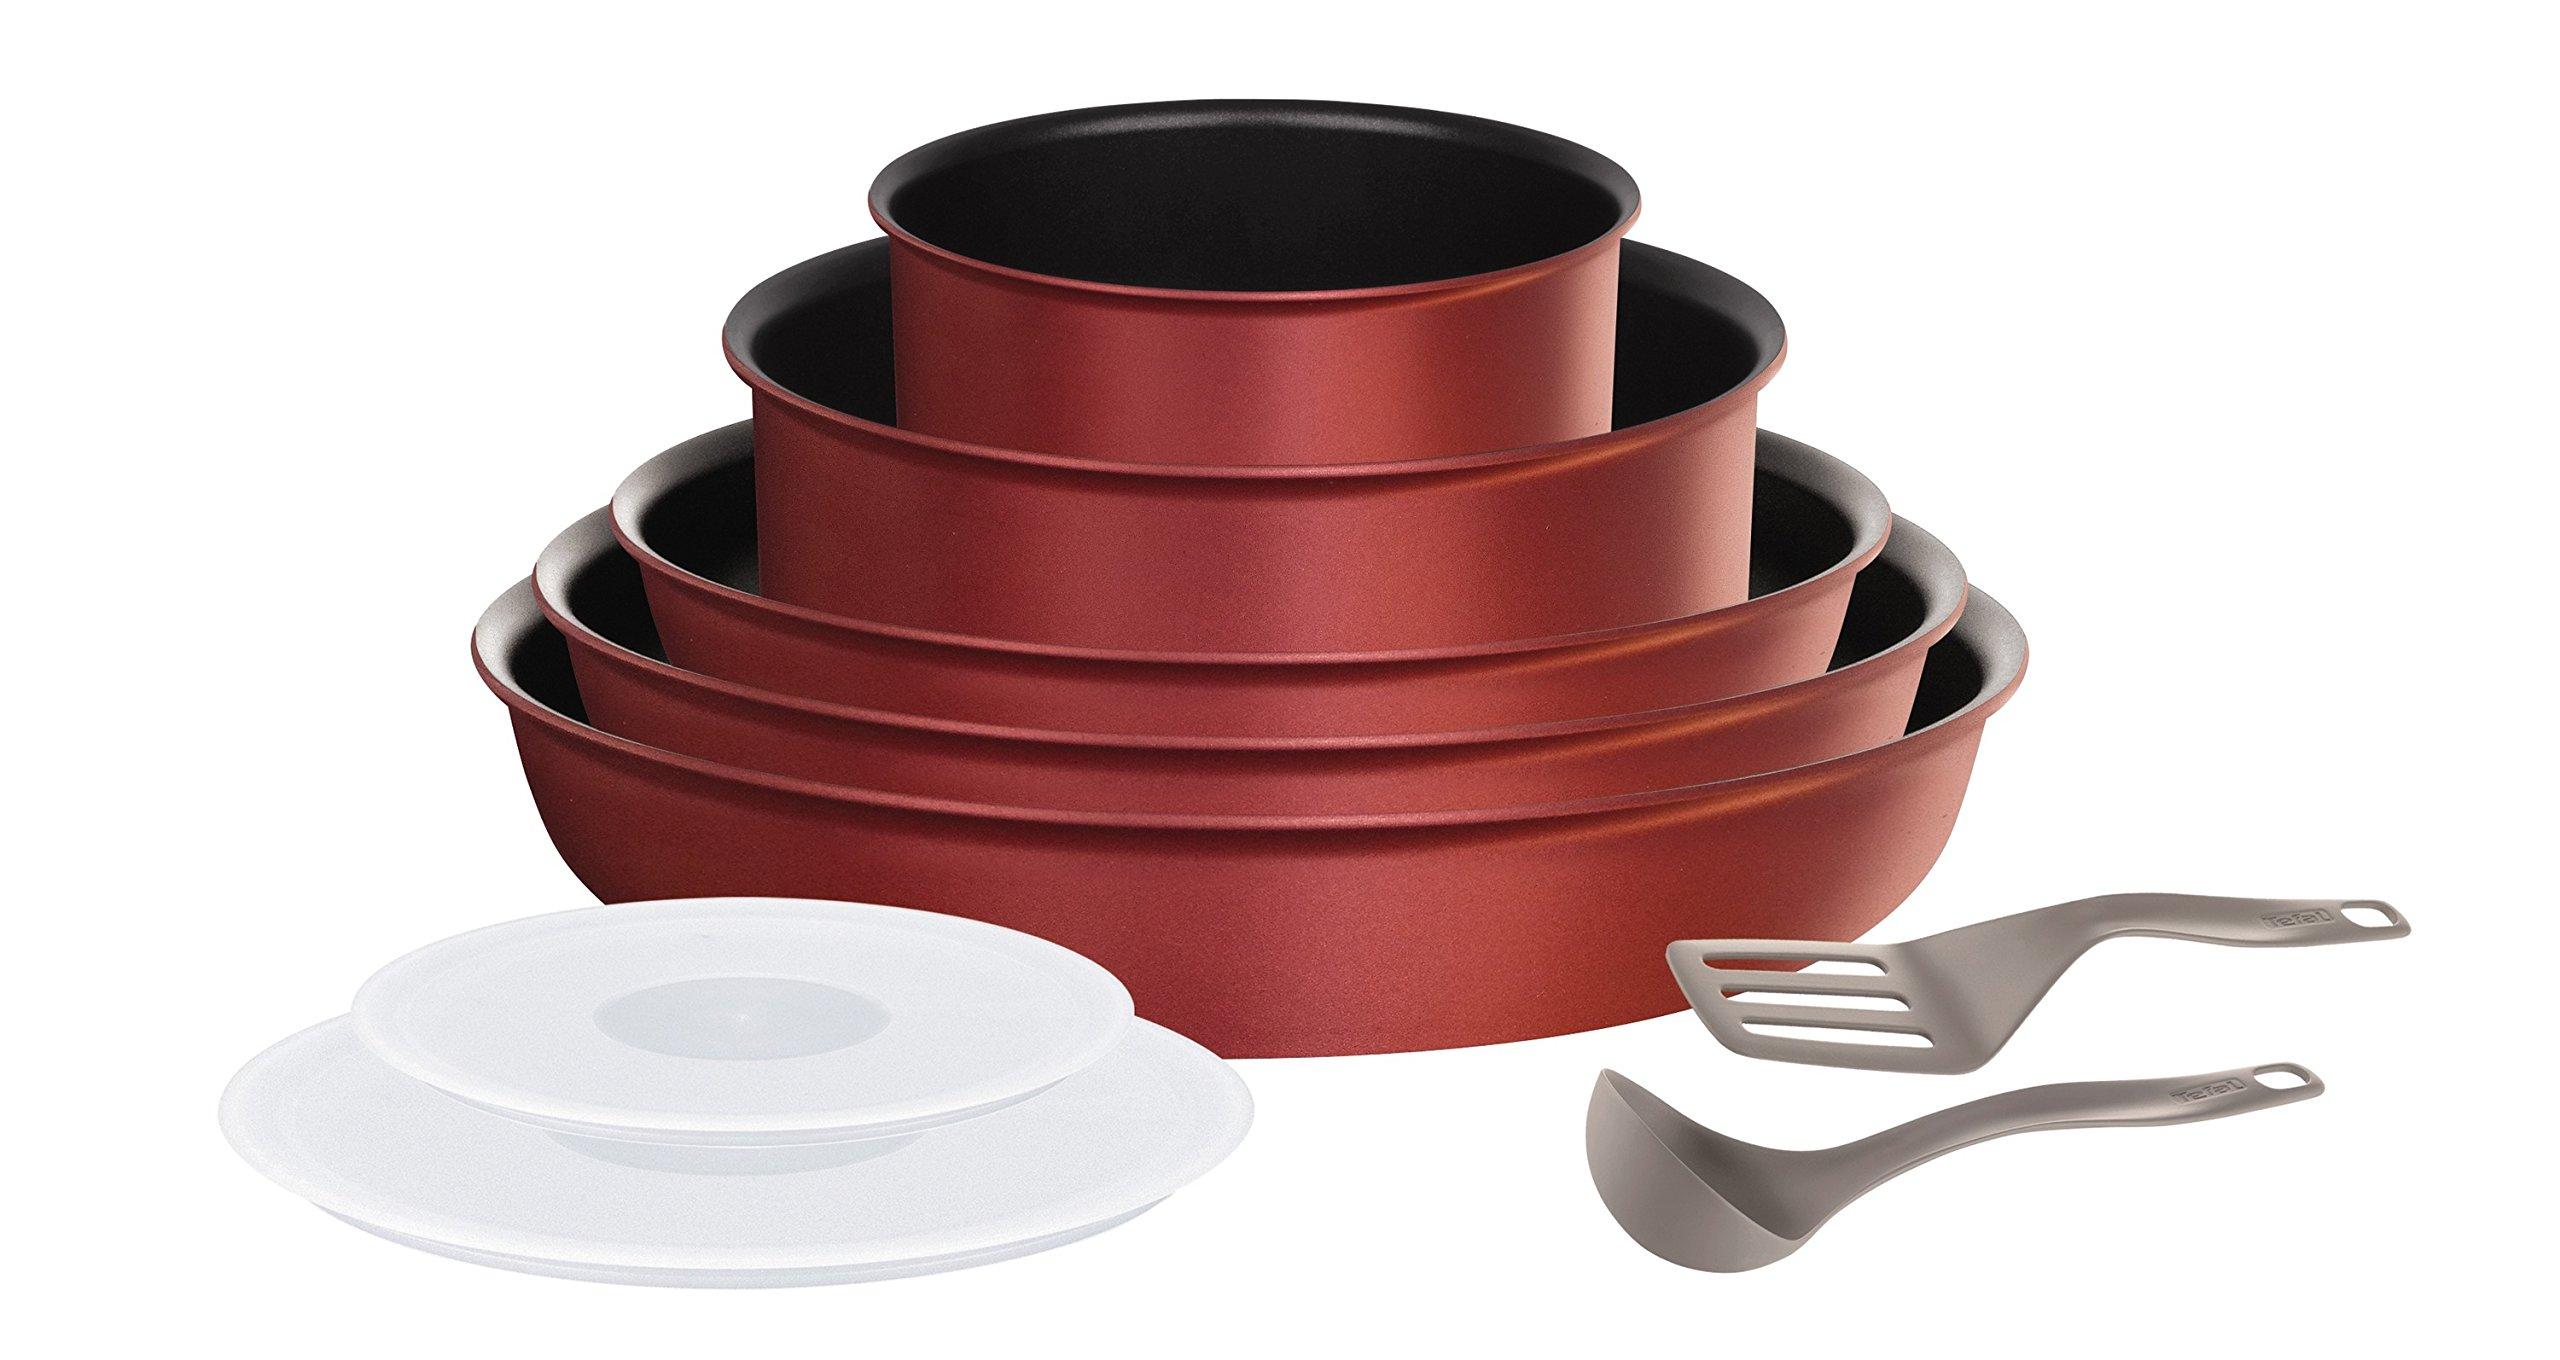 Tefal L6599302 3 - pan sets